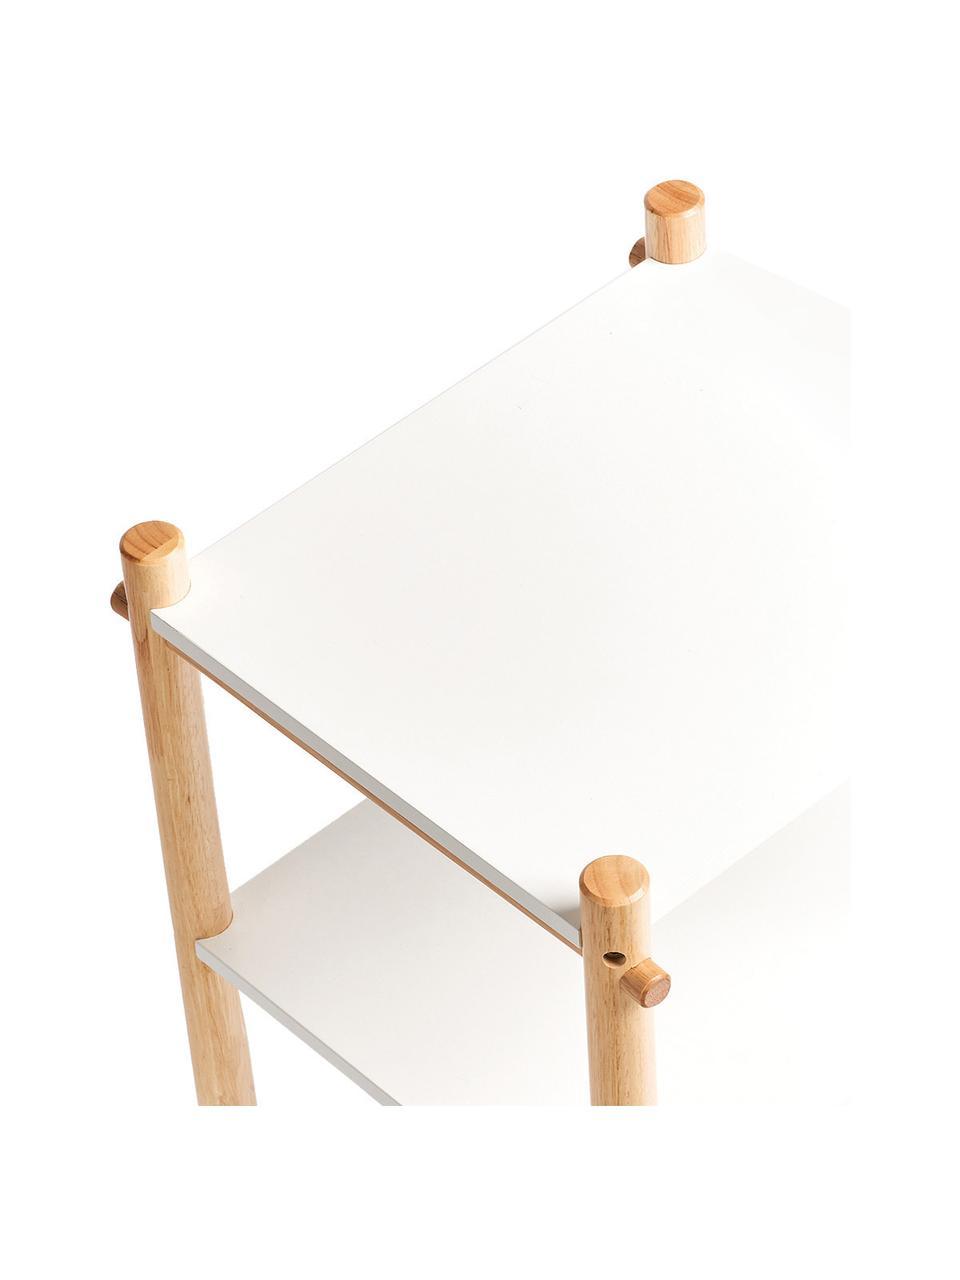 Kinder-Regal Loko, Gestell: Kiefer mit Kunststoffbesc, Weiß, Beige, 36 x 59 cm